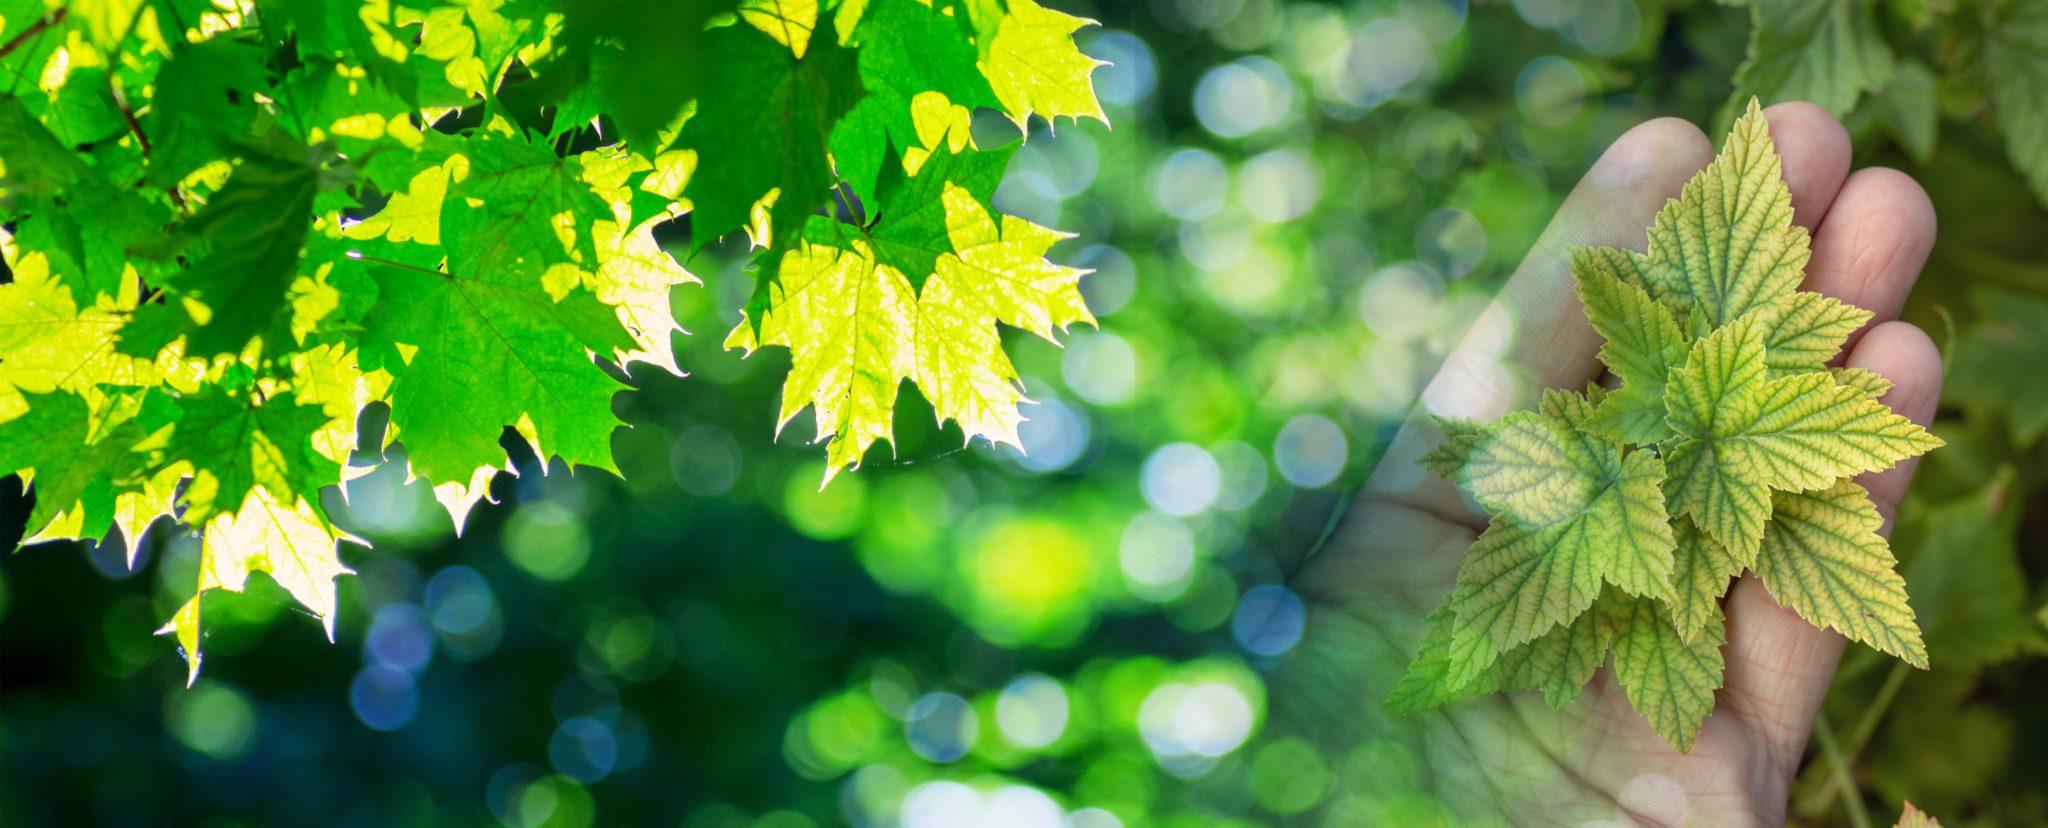 Tree blend Chlorosis vs healthy maple